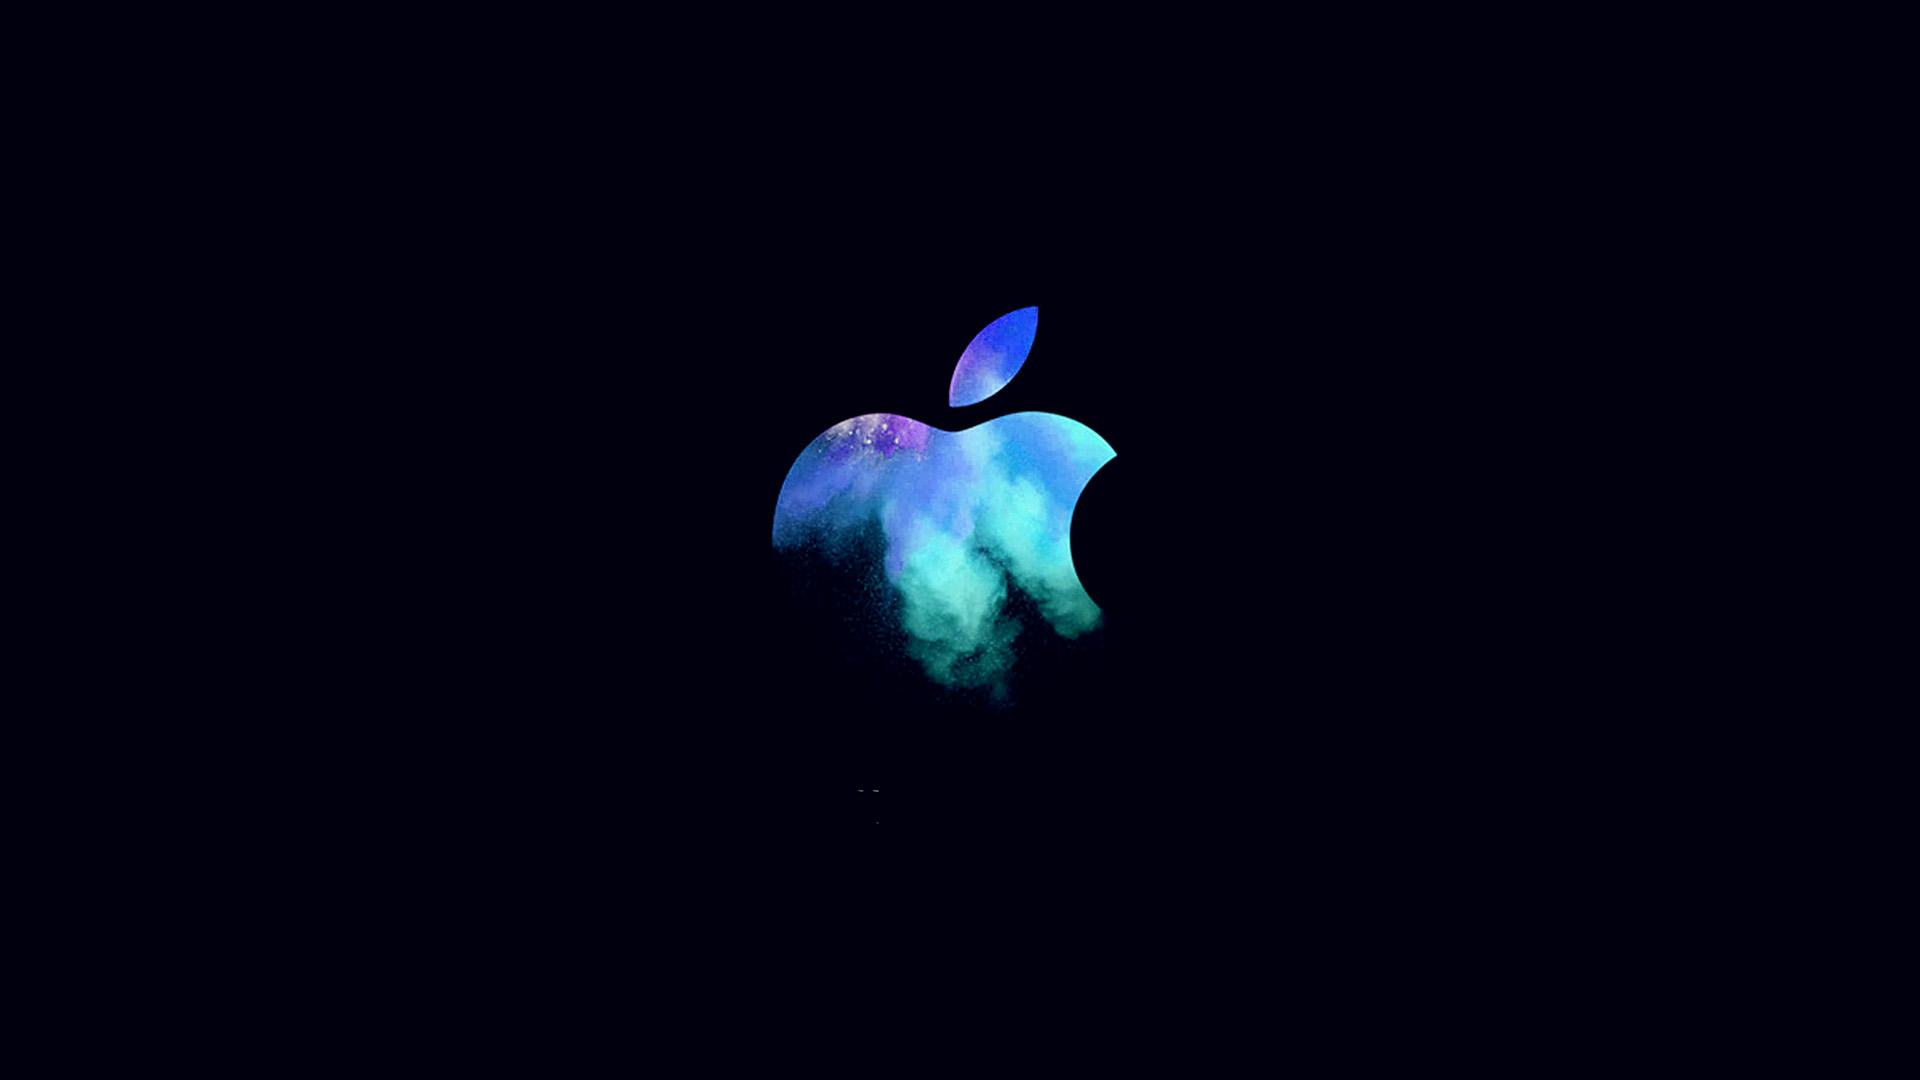 Ipad Retina Wallpaper For Iphone X 8 7 6: Au33-apple-mac-event-logo-dark-illustration-art-blue-wallpaper